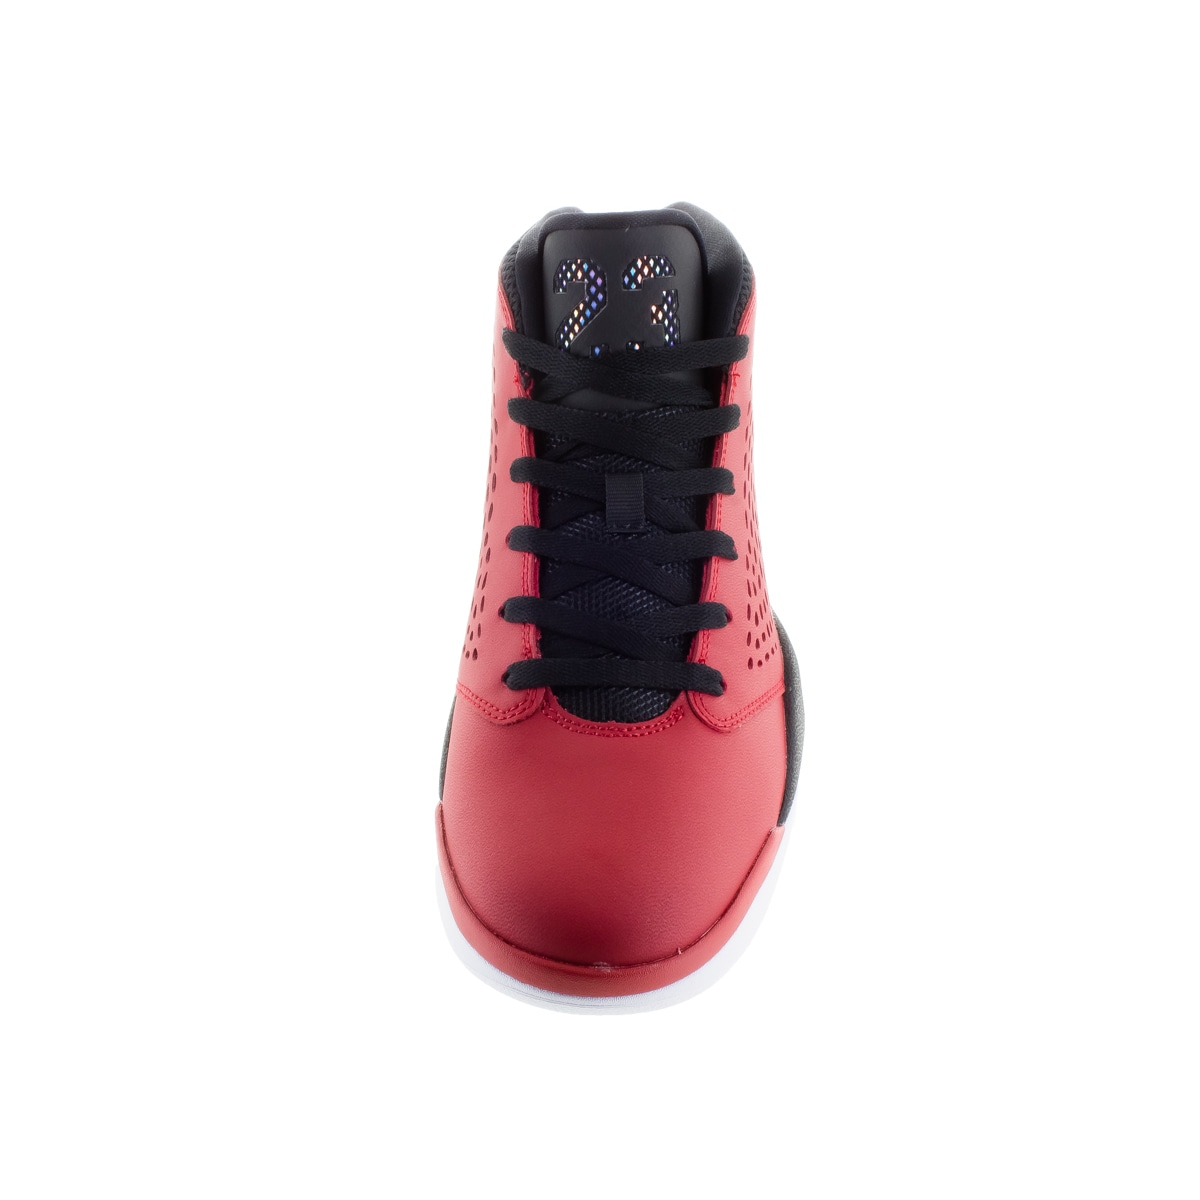 06aa0f275af8 Shop Nike Jordan Men s Jordan Flight 2015 Gym Red White Black White  Basketball Shoe - Free Shipping Today - Overstock.com - 12318454